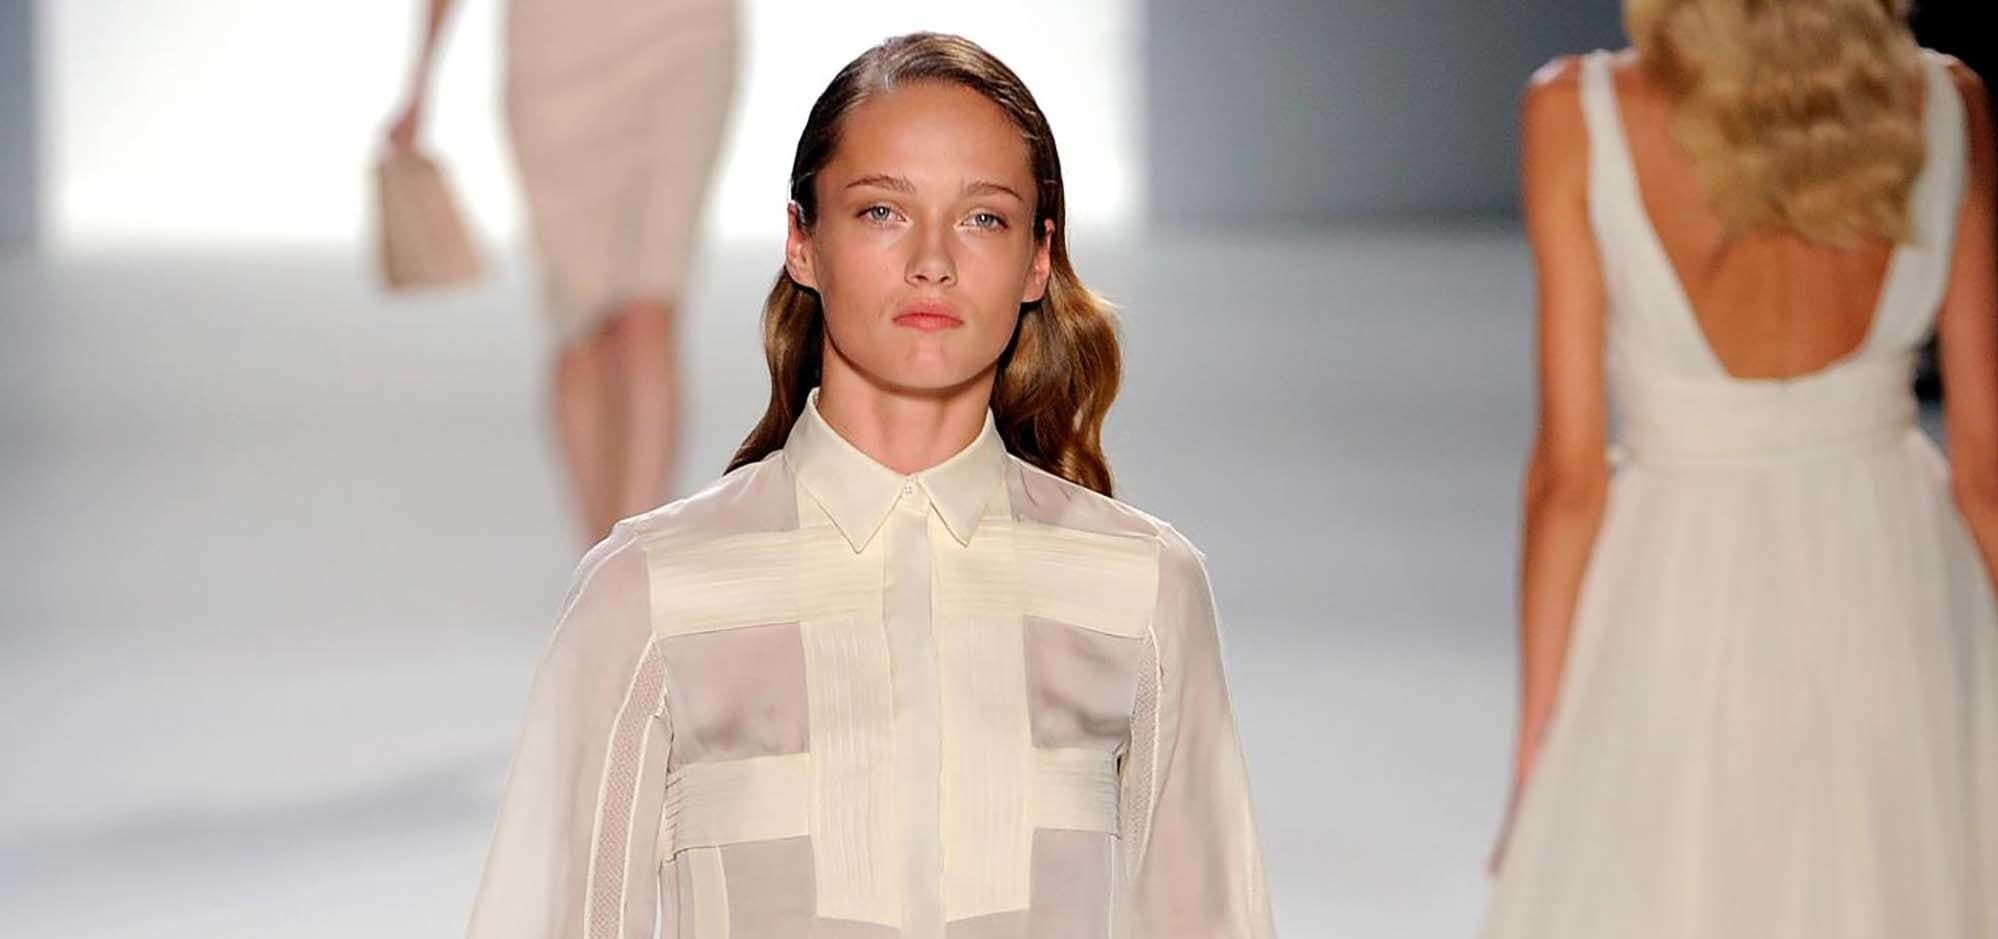 Modelo loira desfila usando roupa branca na passarela